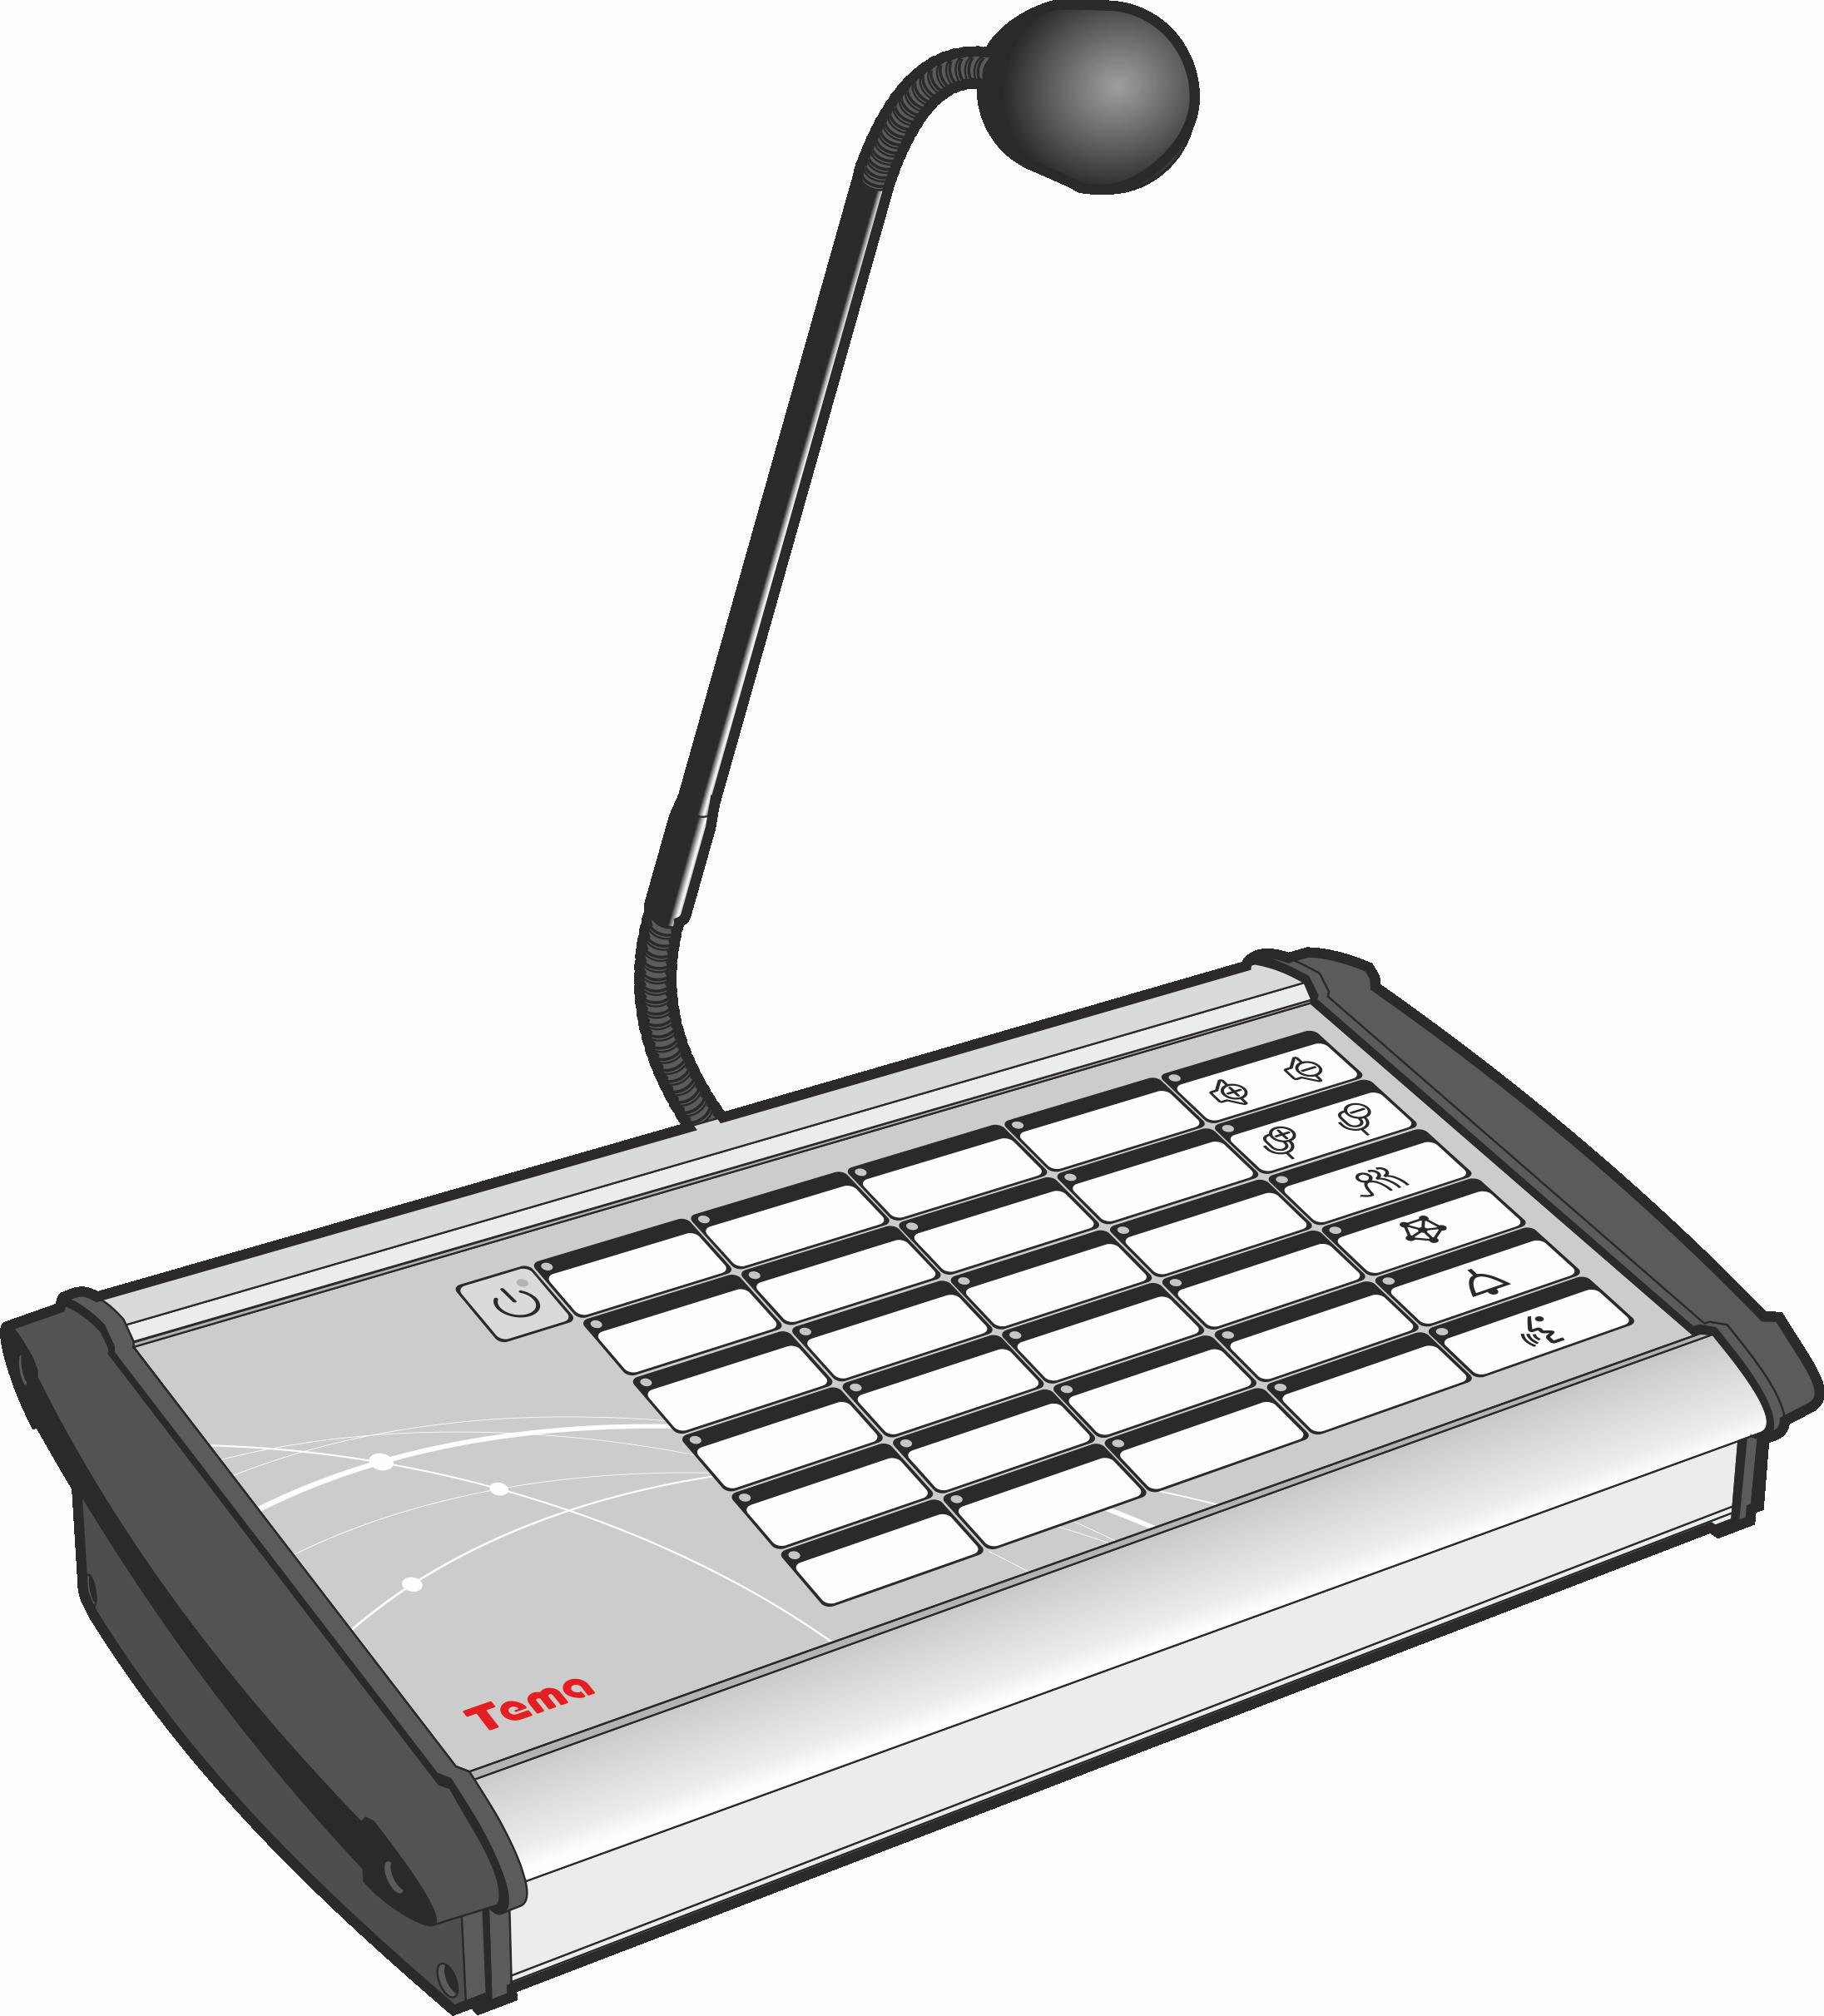 Диспетчерский пульт, Коммутатор Ряд Tema-APX24x.xx